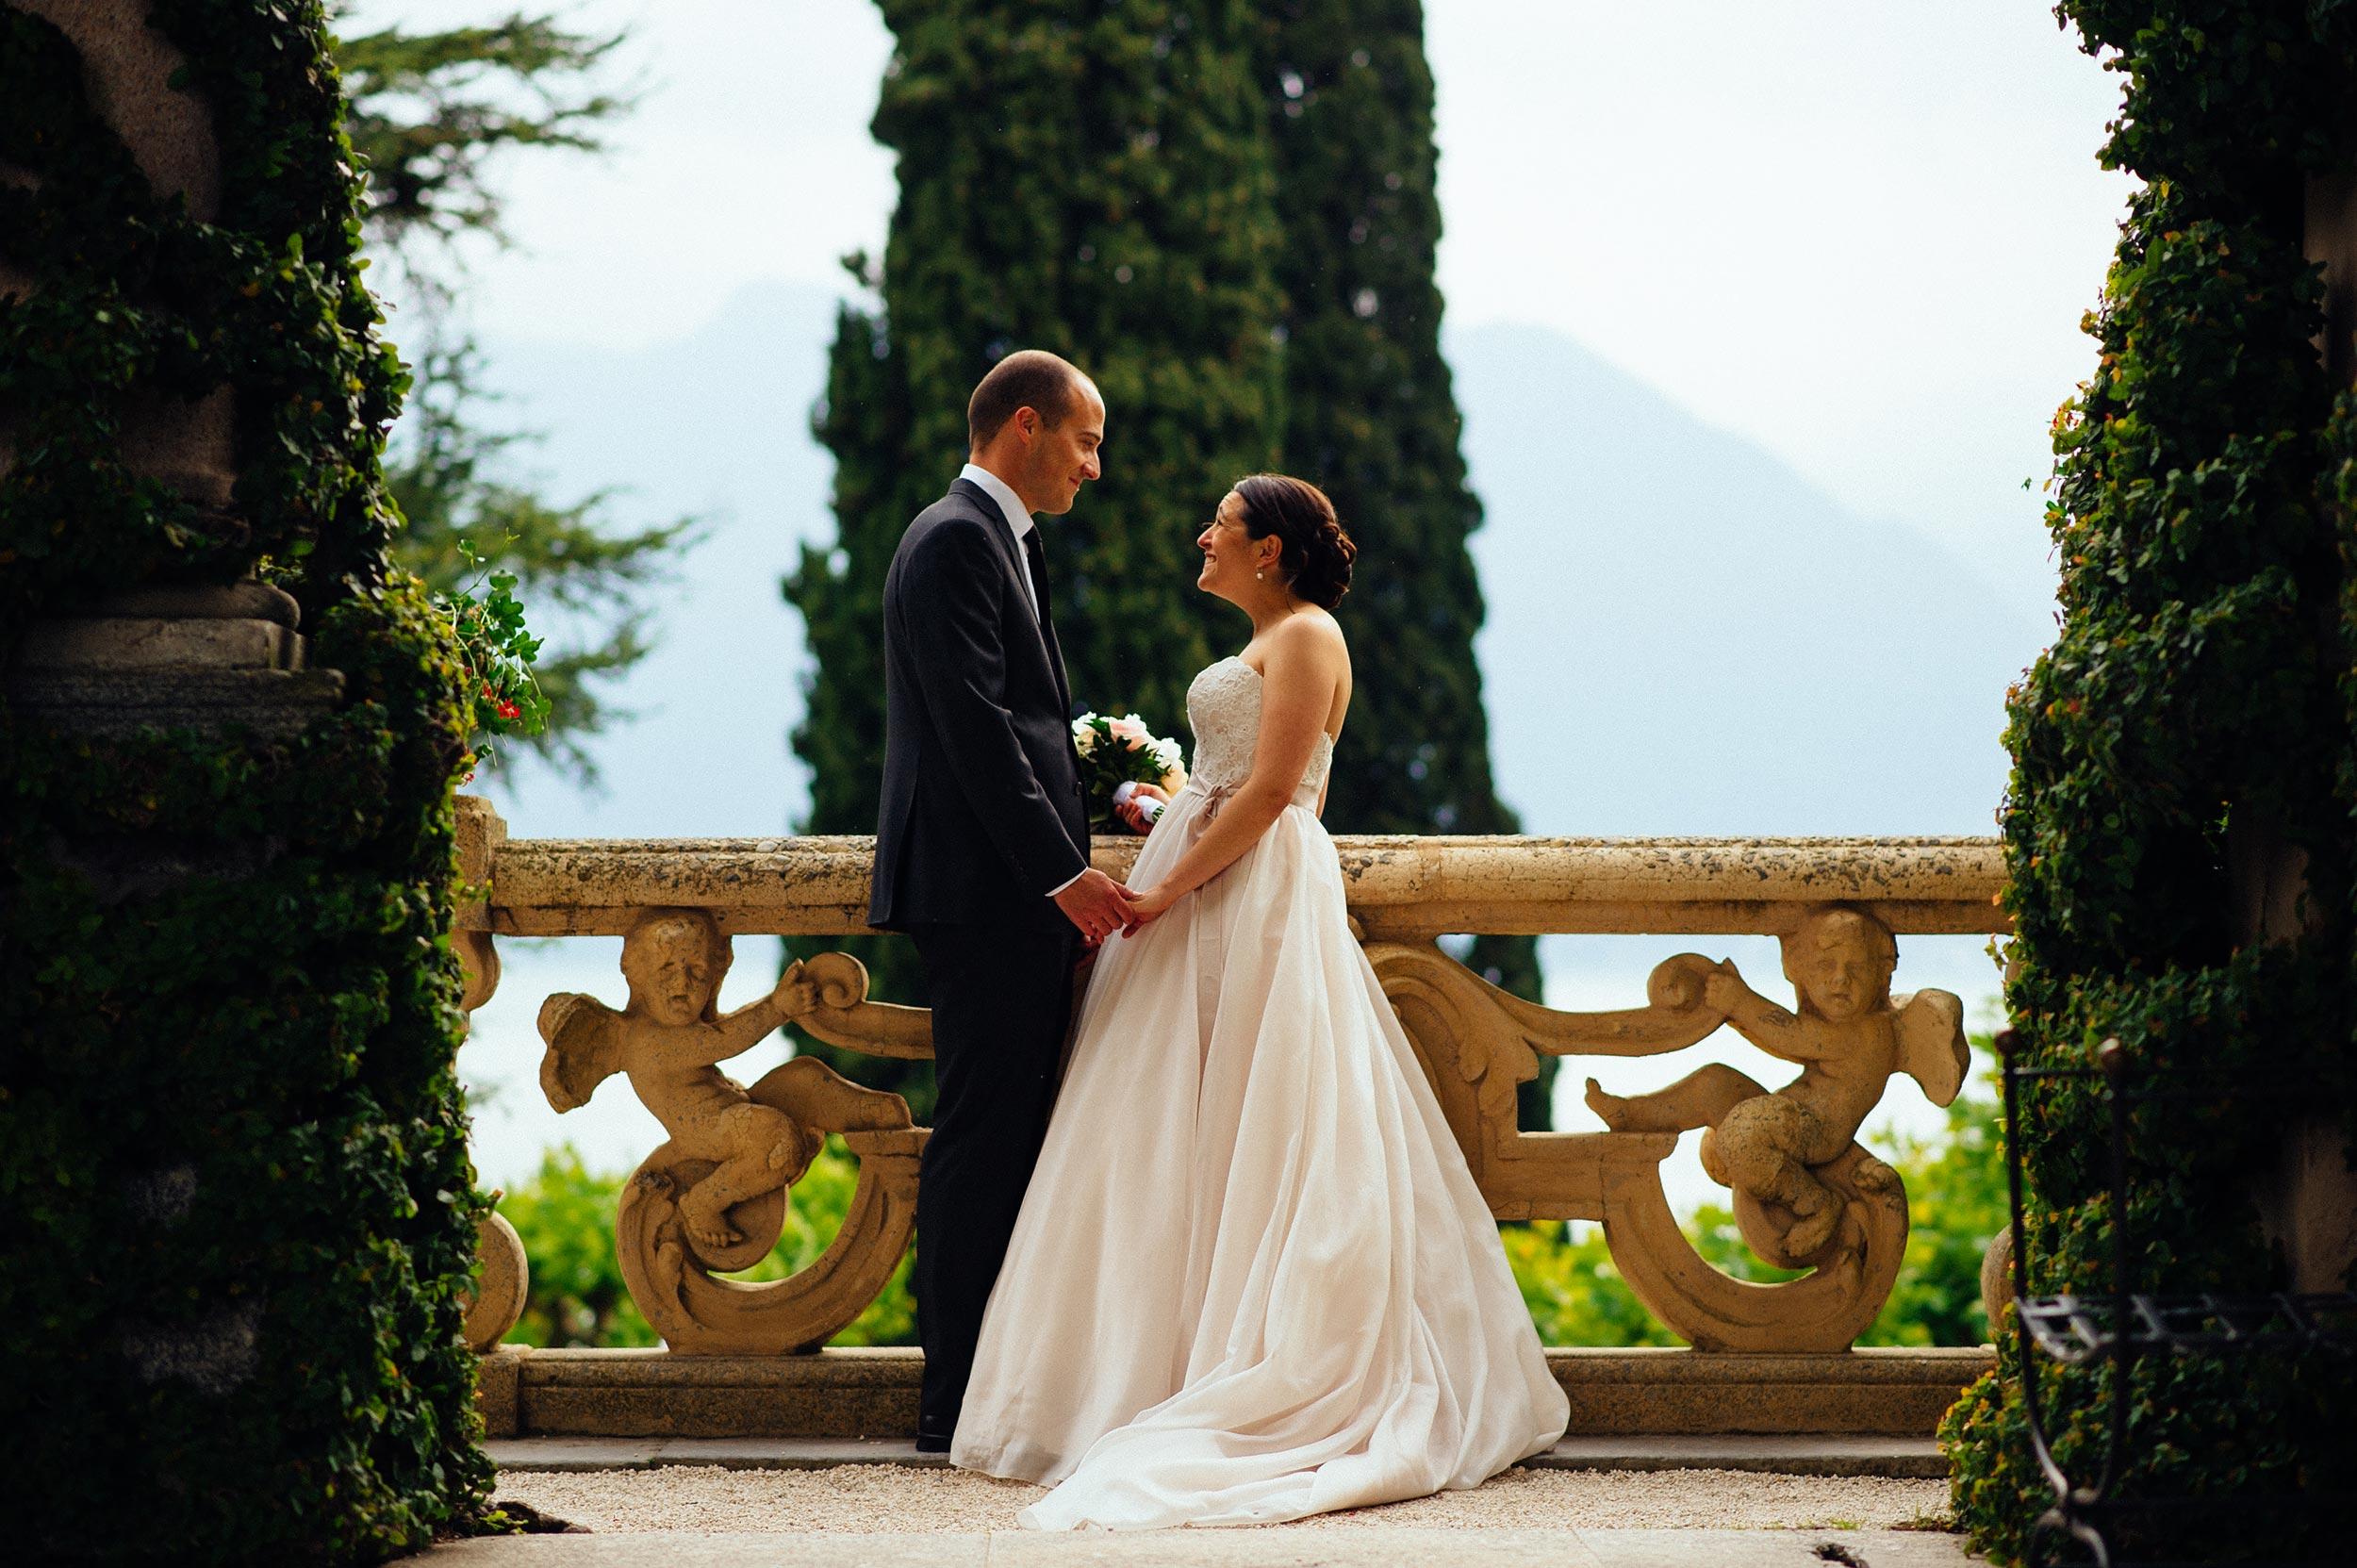 2015-Jon-Lauren-Bellagio-Lake-Como-Wedding-Photographer-Italy-Alessandro-Avenali-35.jpg